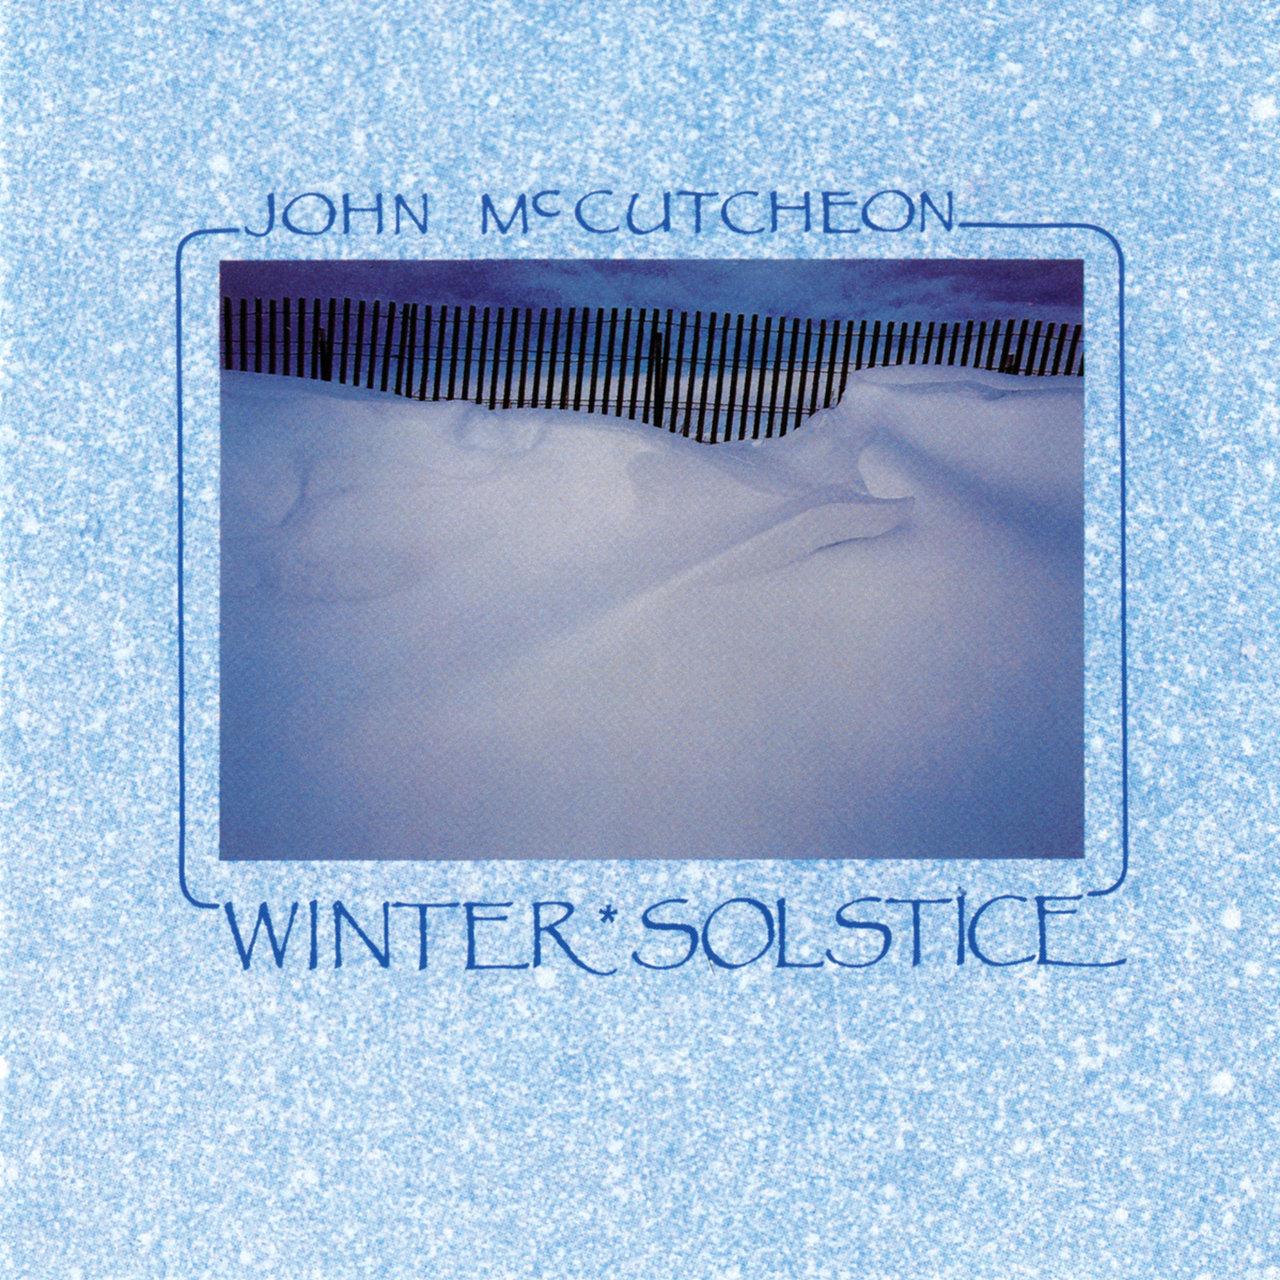 TIDAL: Listen to Winter Solstice on TIDAL